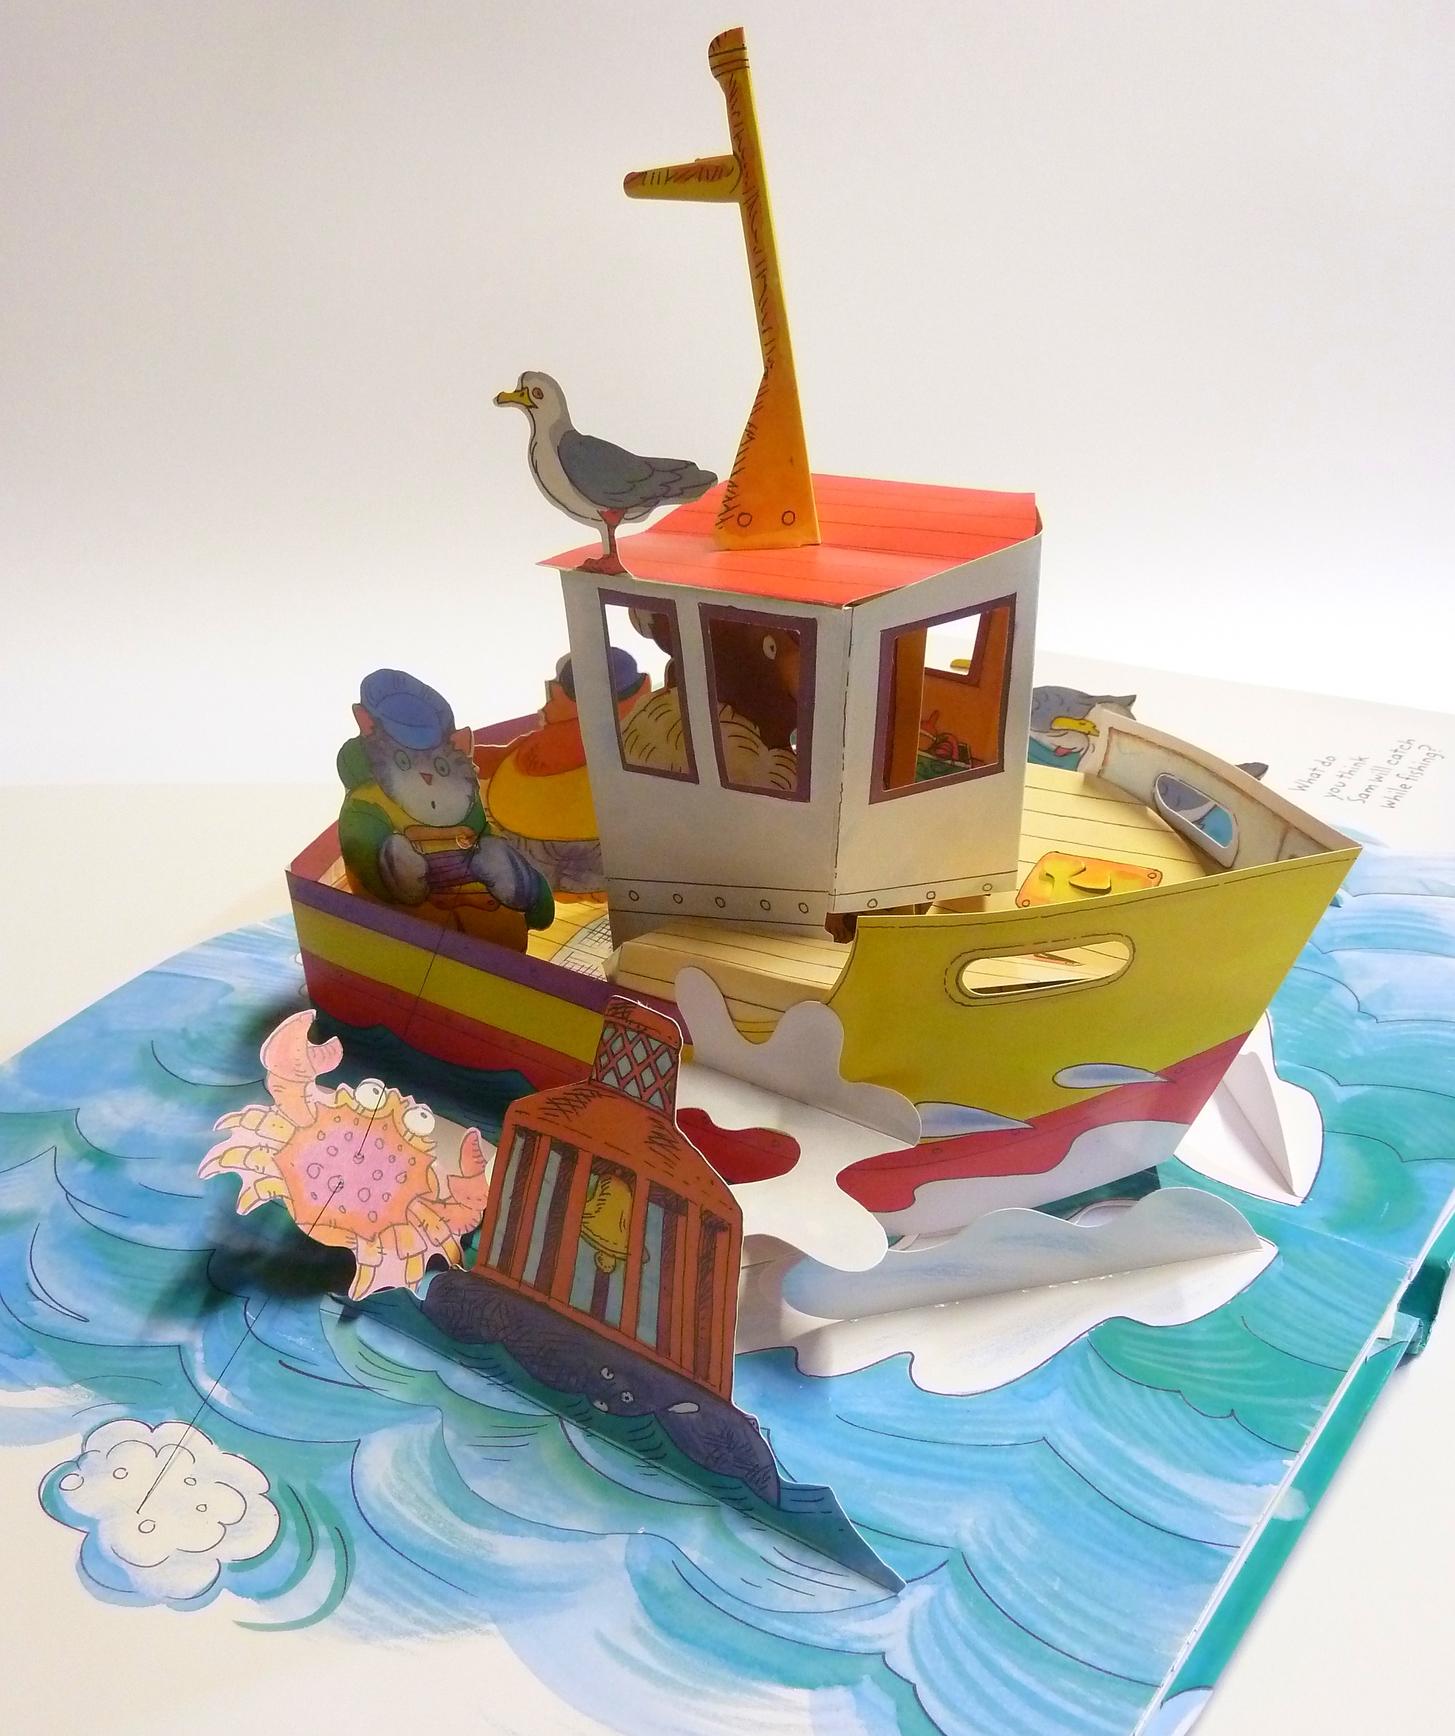 My Amazing POP-UP Boat